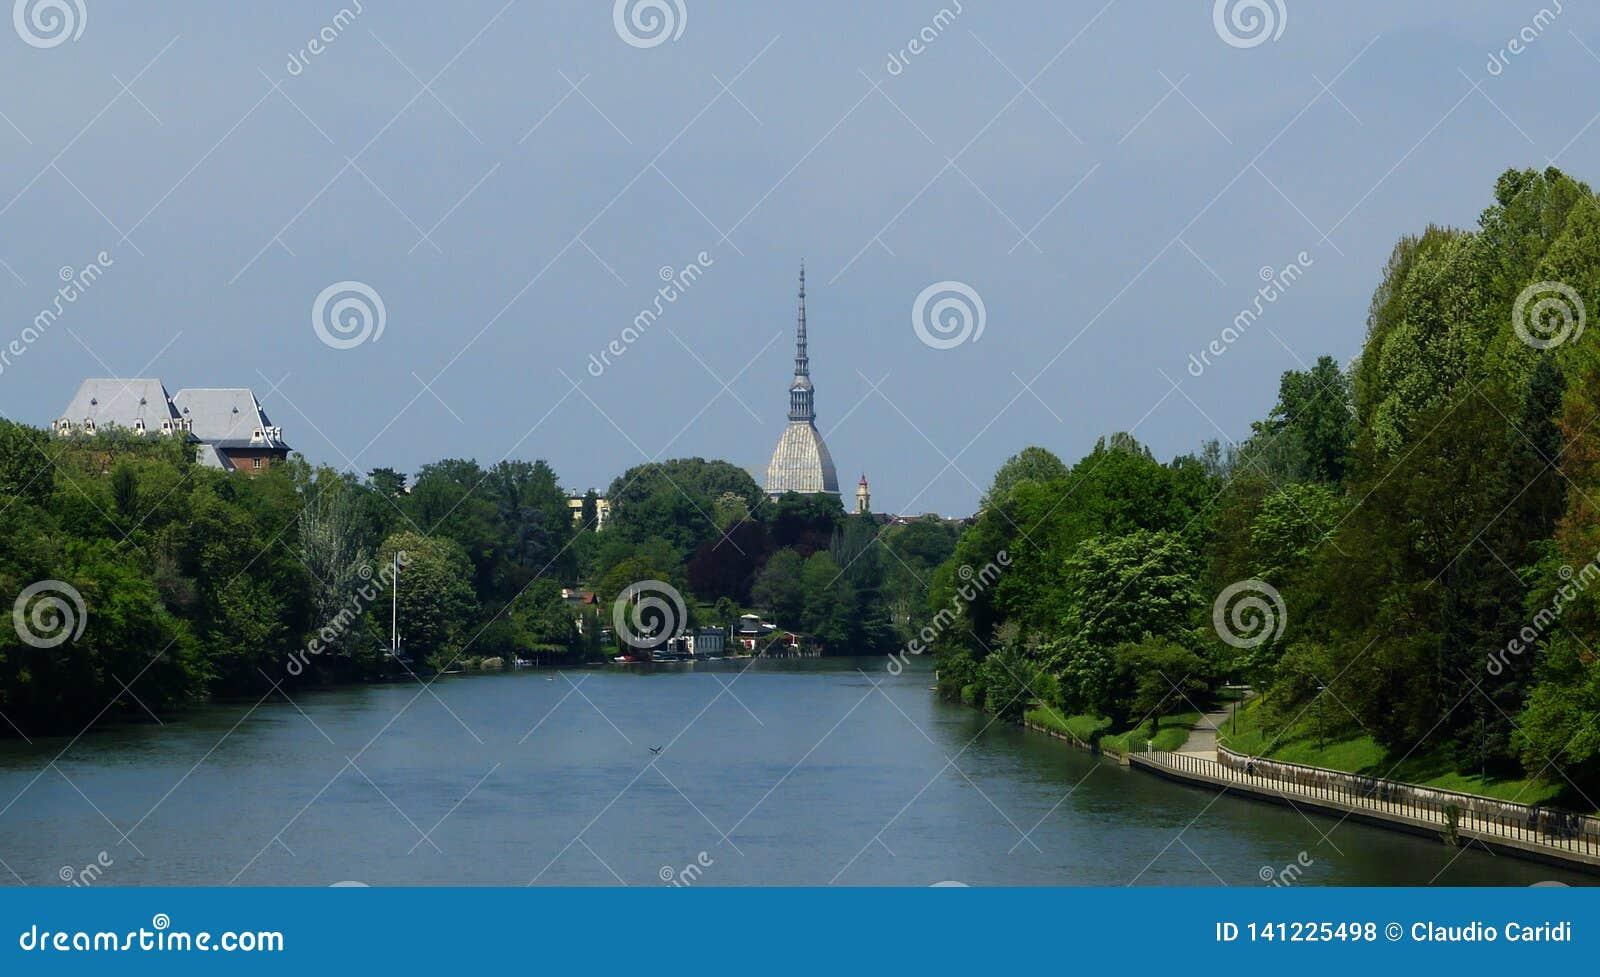 Panorama of Turin Torino with the Mole Antonelliana and river Po, Italy